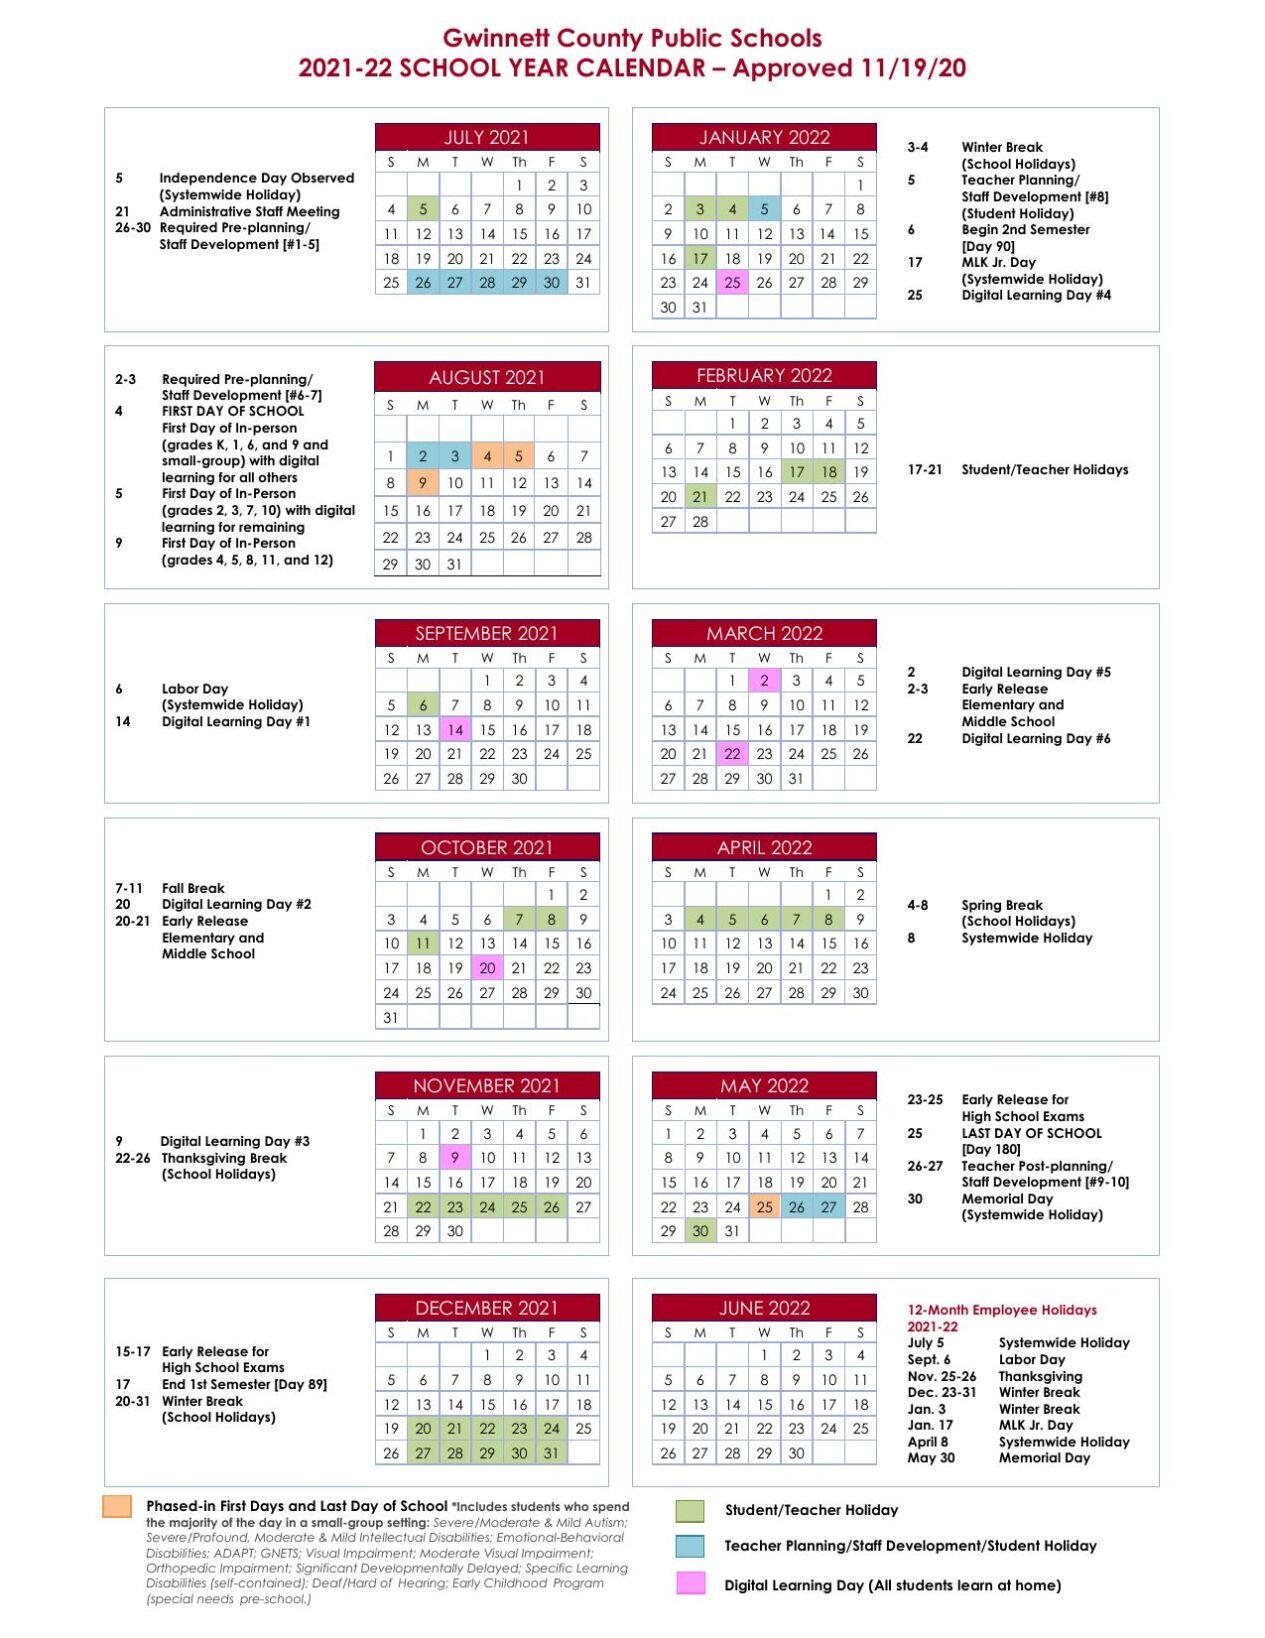 Cobb County Schools Calendar 2022.Gwinnett County School Calendar 2019 20